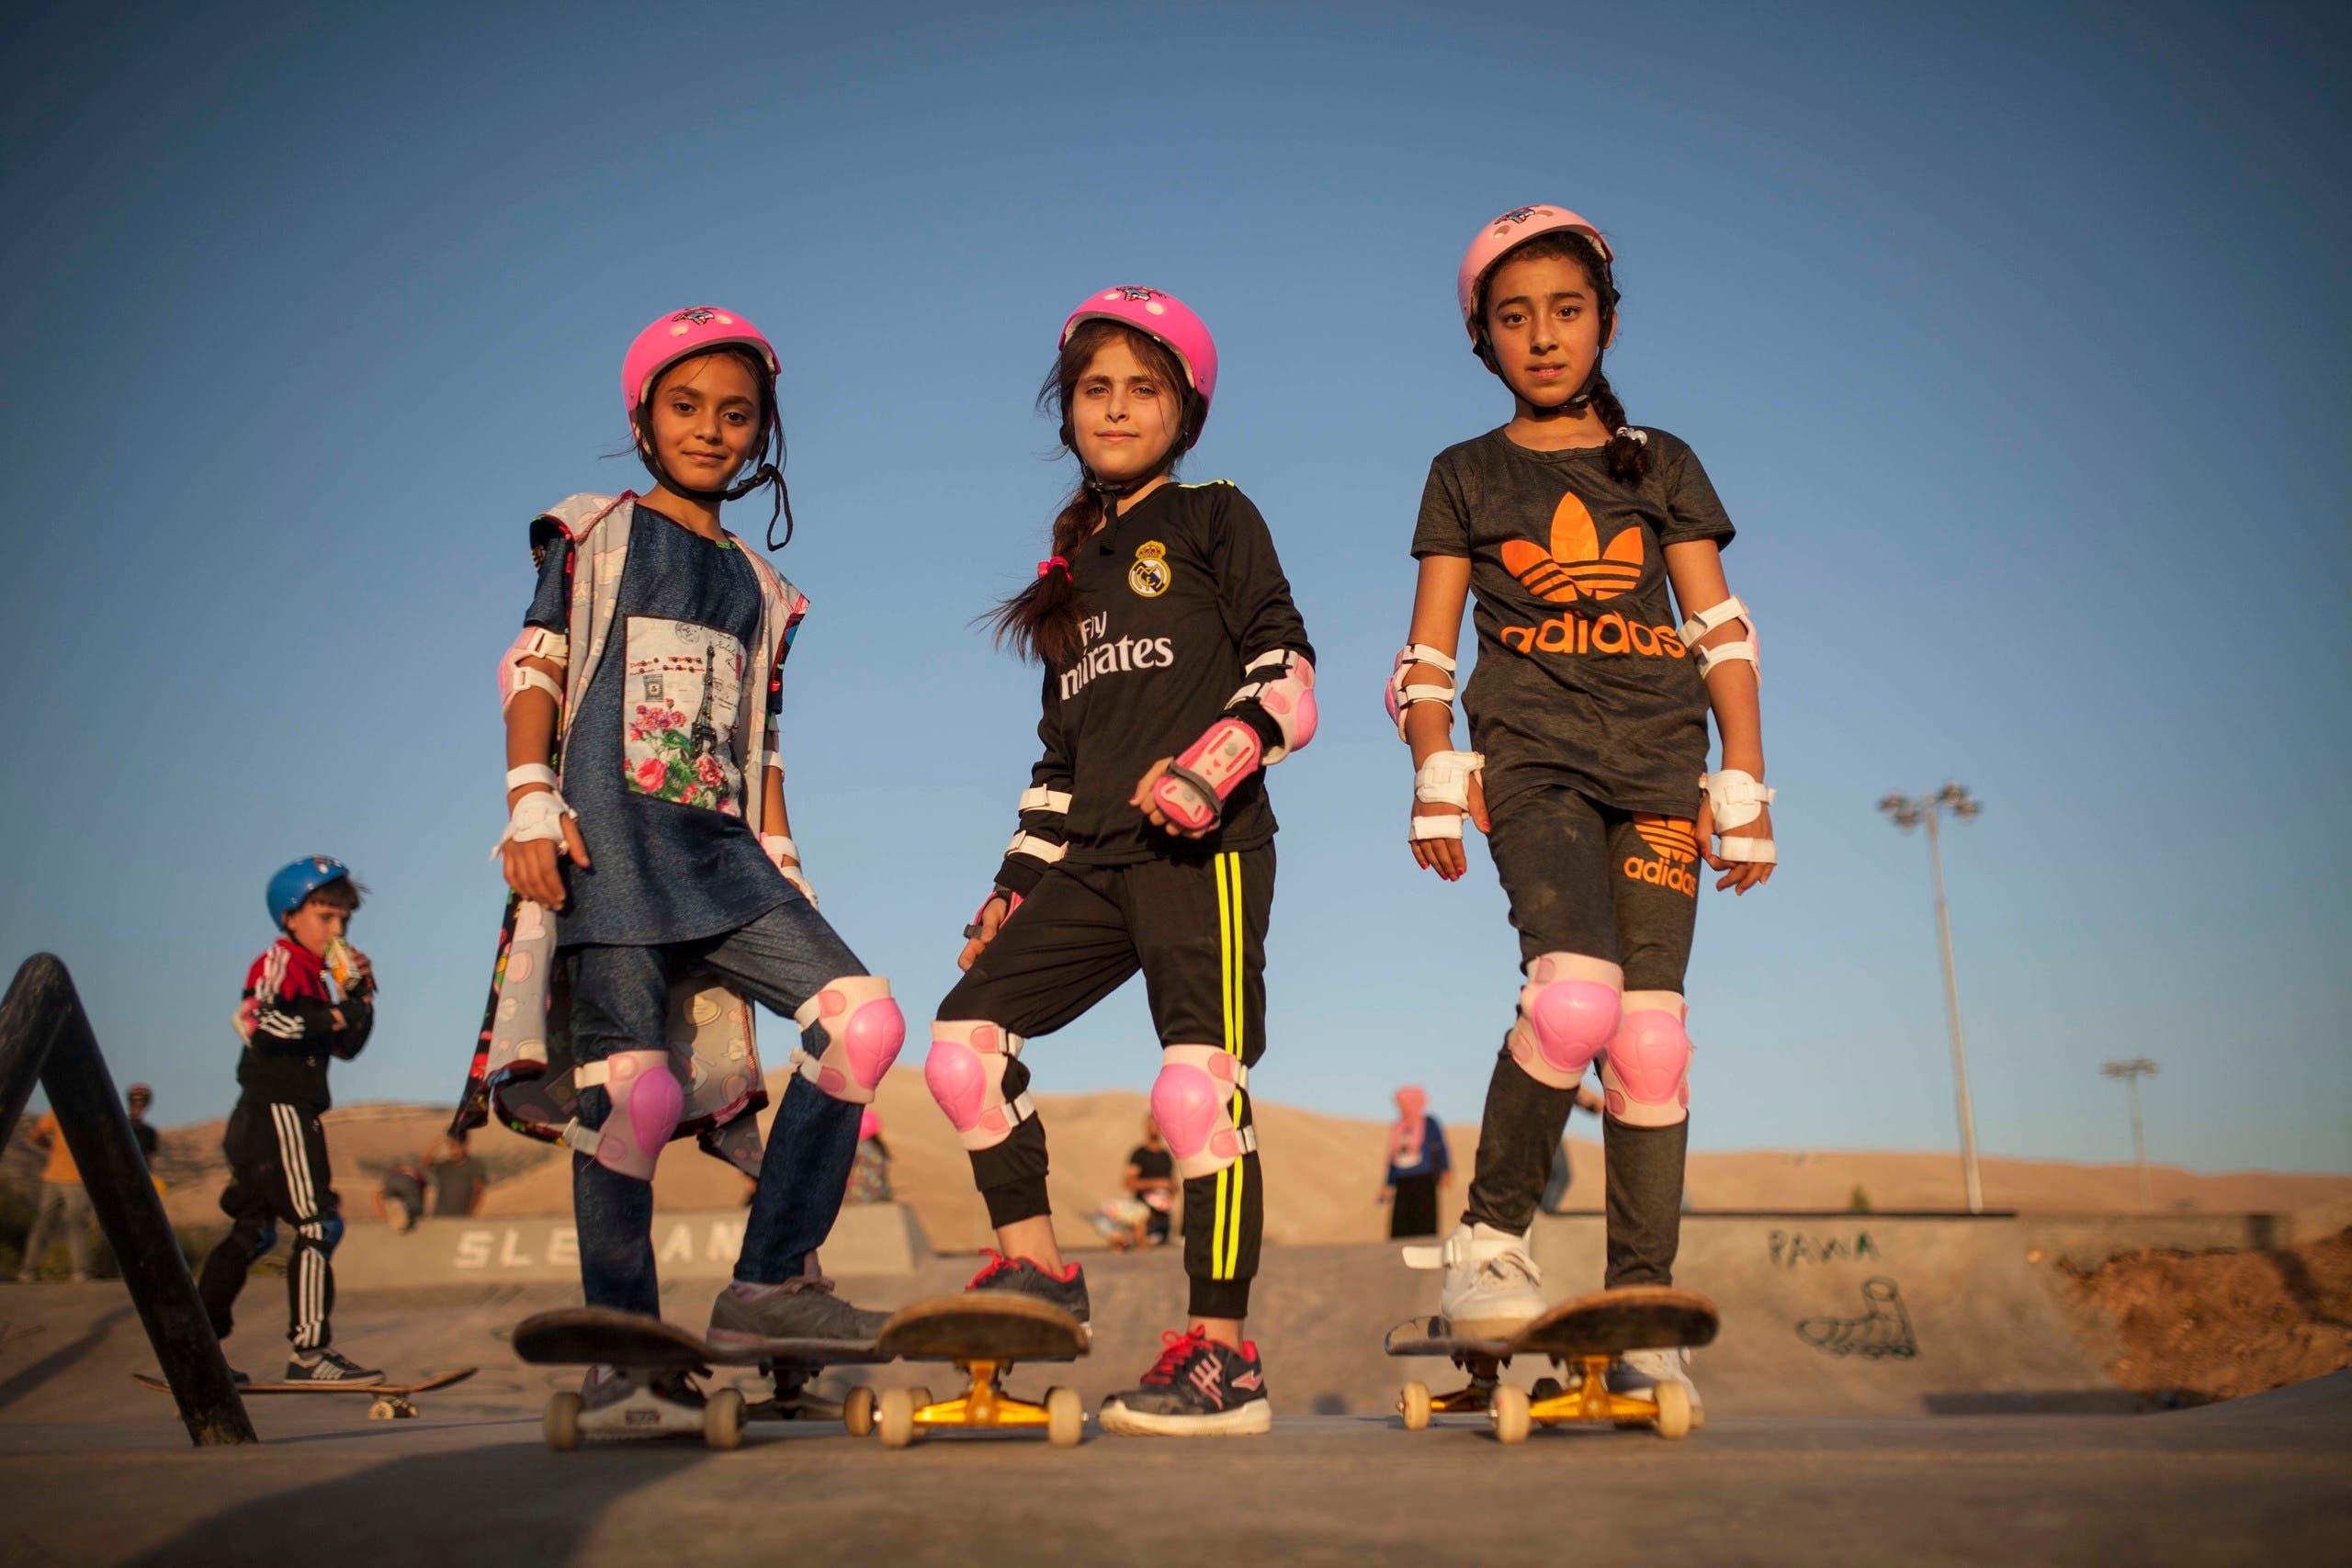 Girls pose at Iraq's Suli Skatepark. (Image: Make Life Skate Life)